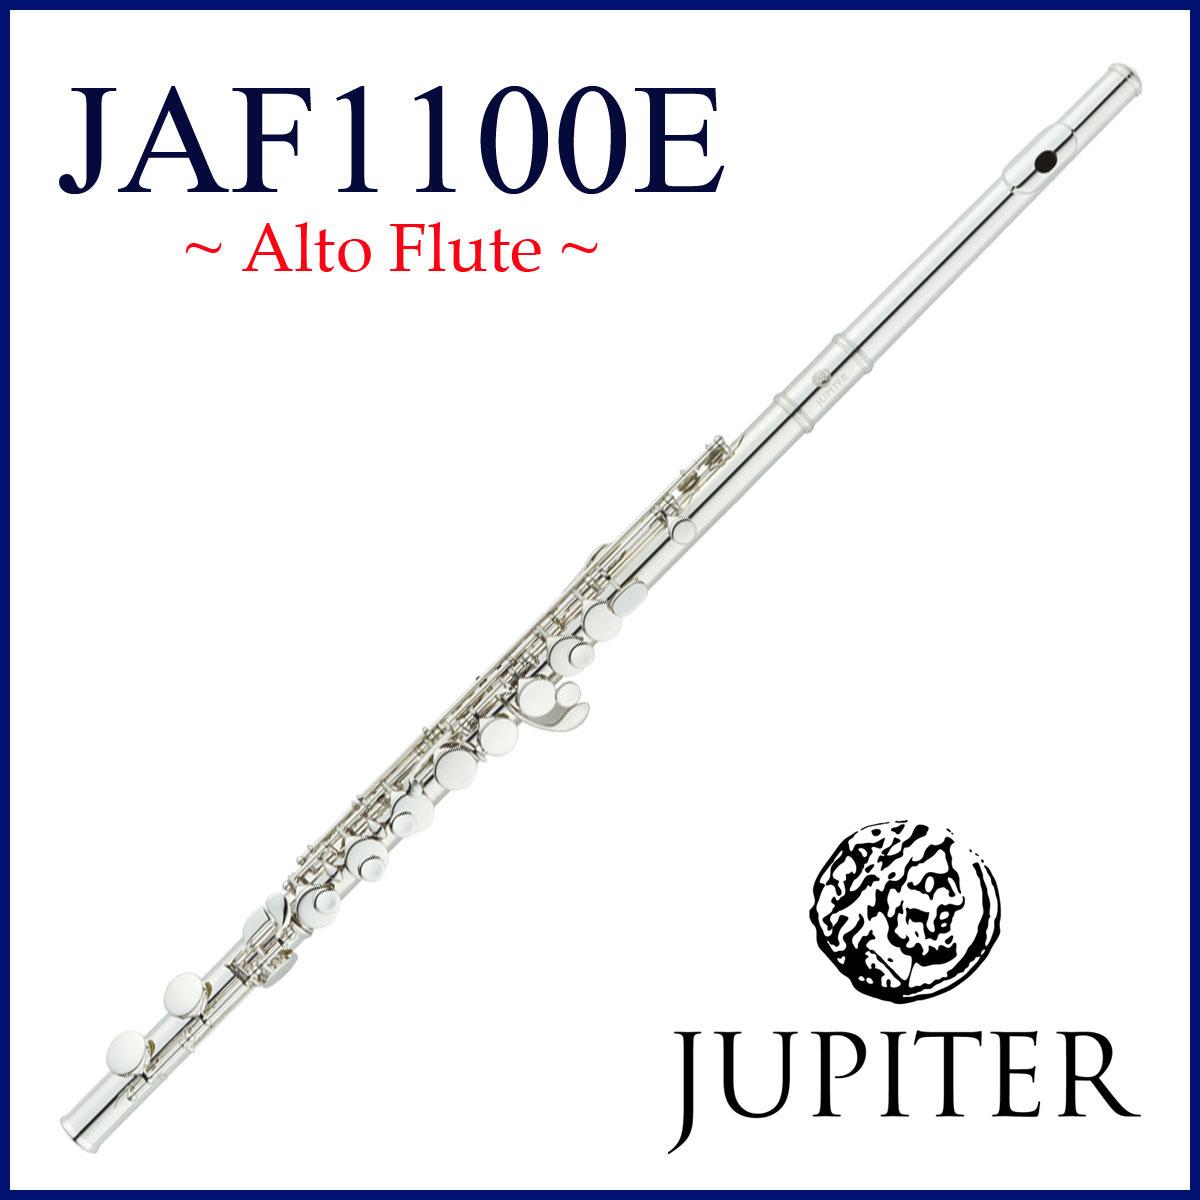 JUPITER / JAF-1100E ジュピター アルトフルート G調 Eメカニズム付 頭部管銀製 ニッケルシルバー管体《お取り寄せ》